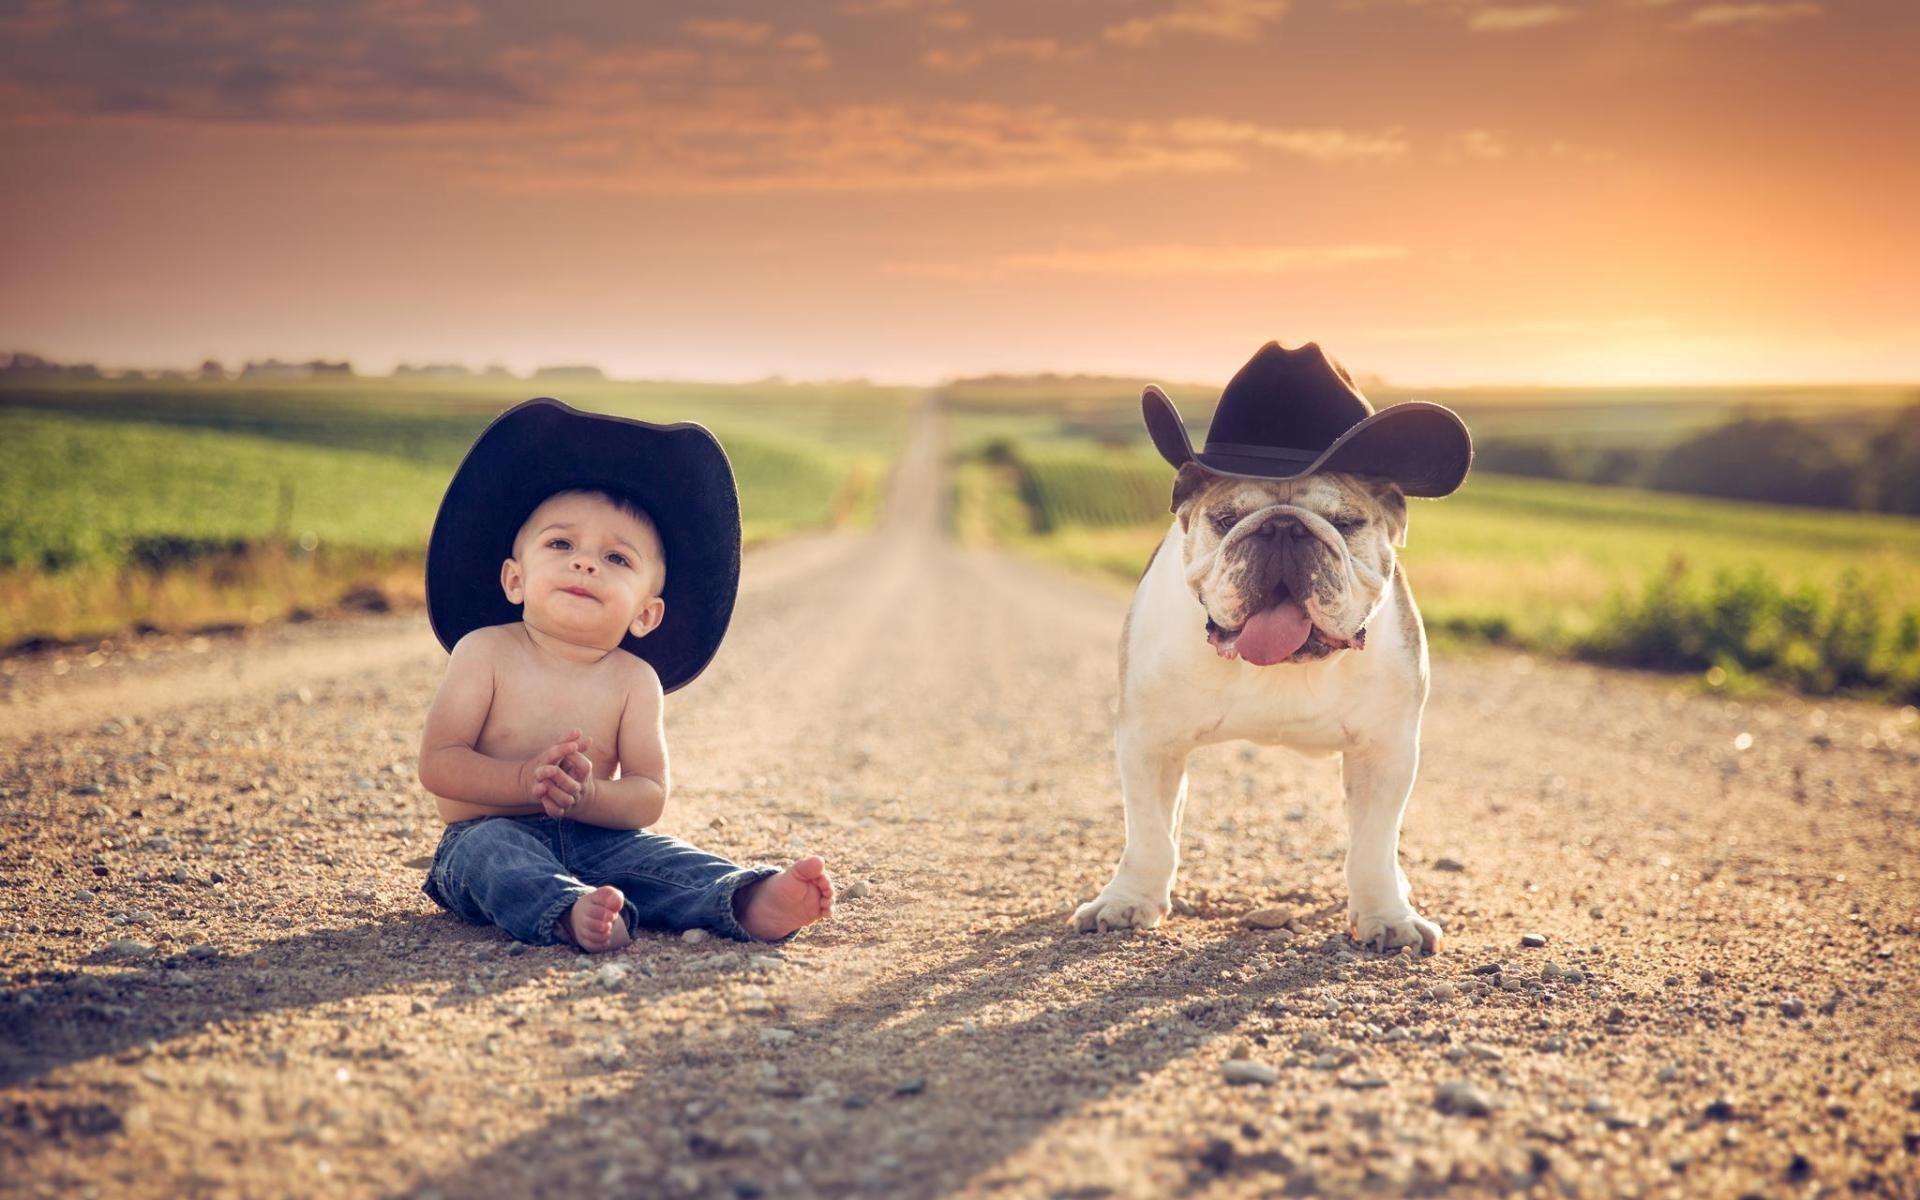 Cute boy hd wallpaper - Little Boy With Bull Dog Cute Funny Wallpapers